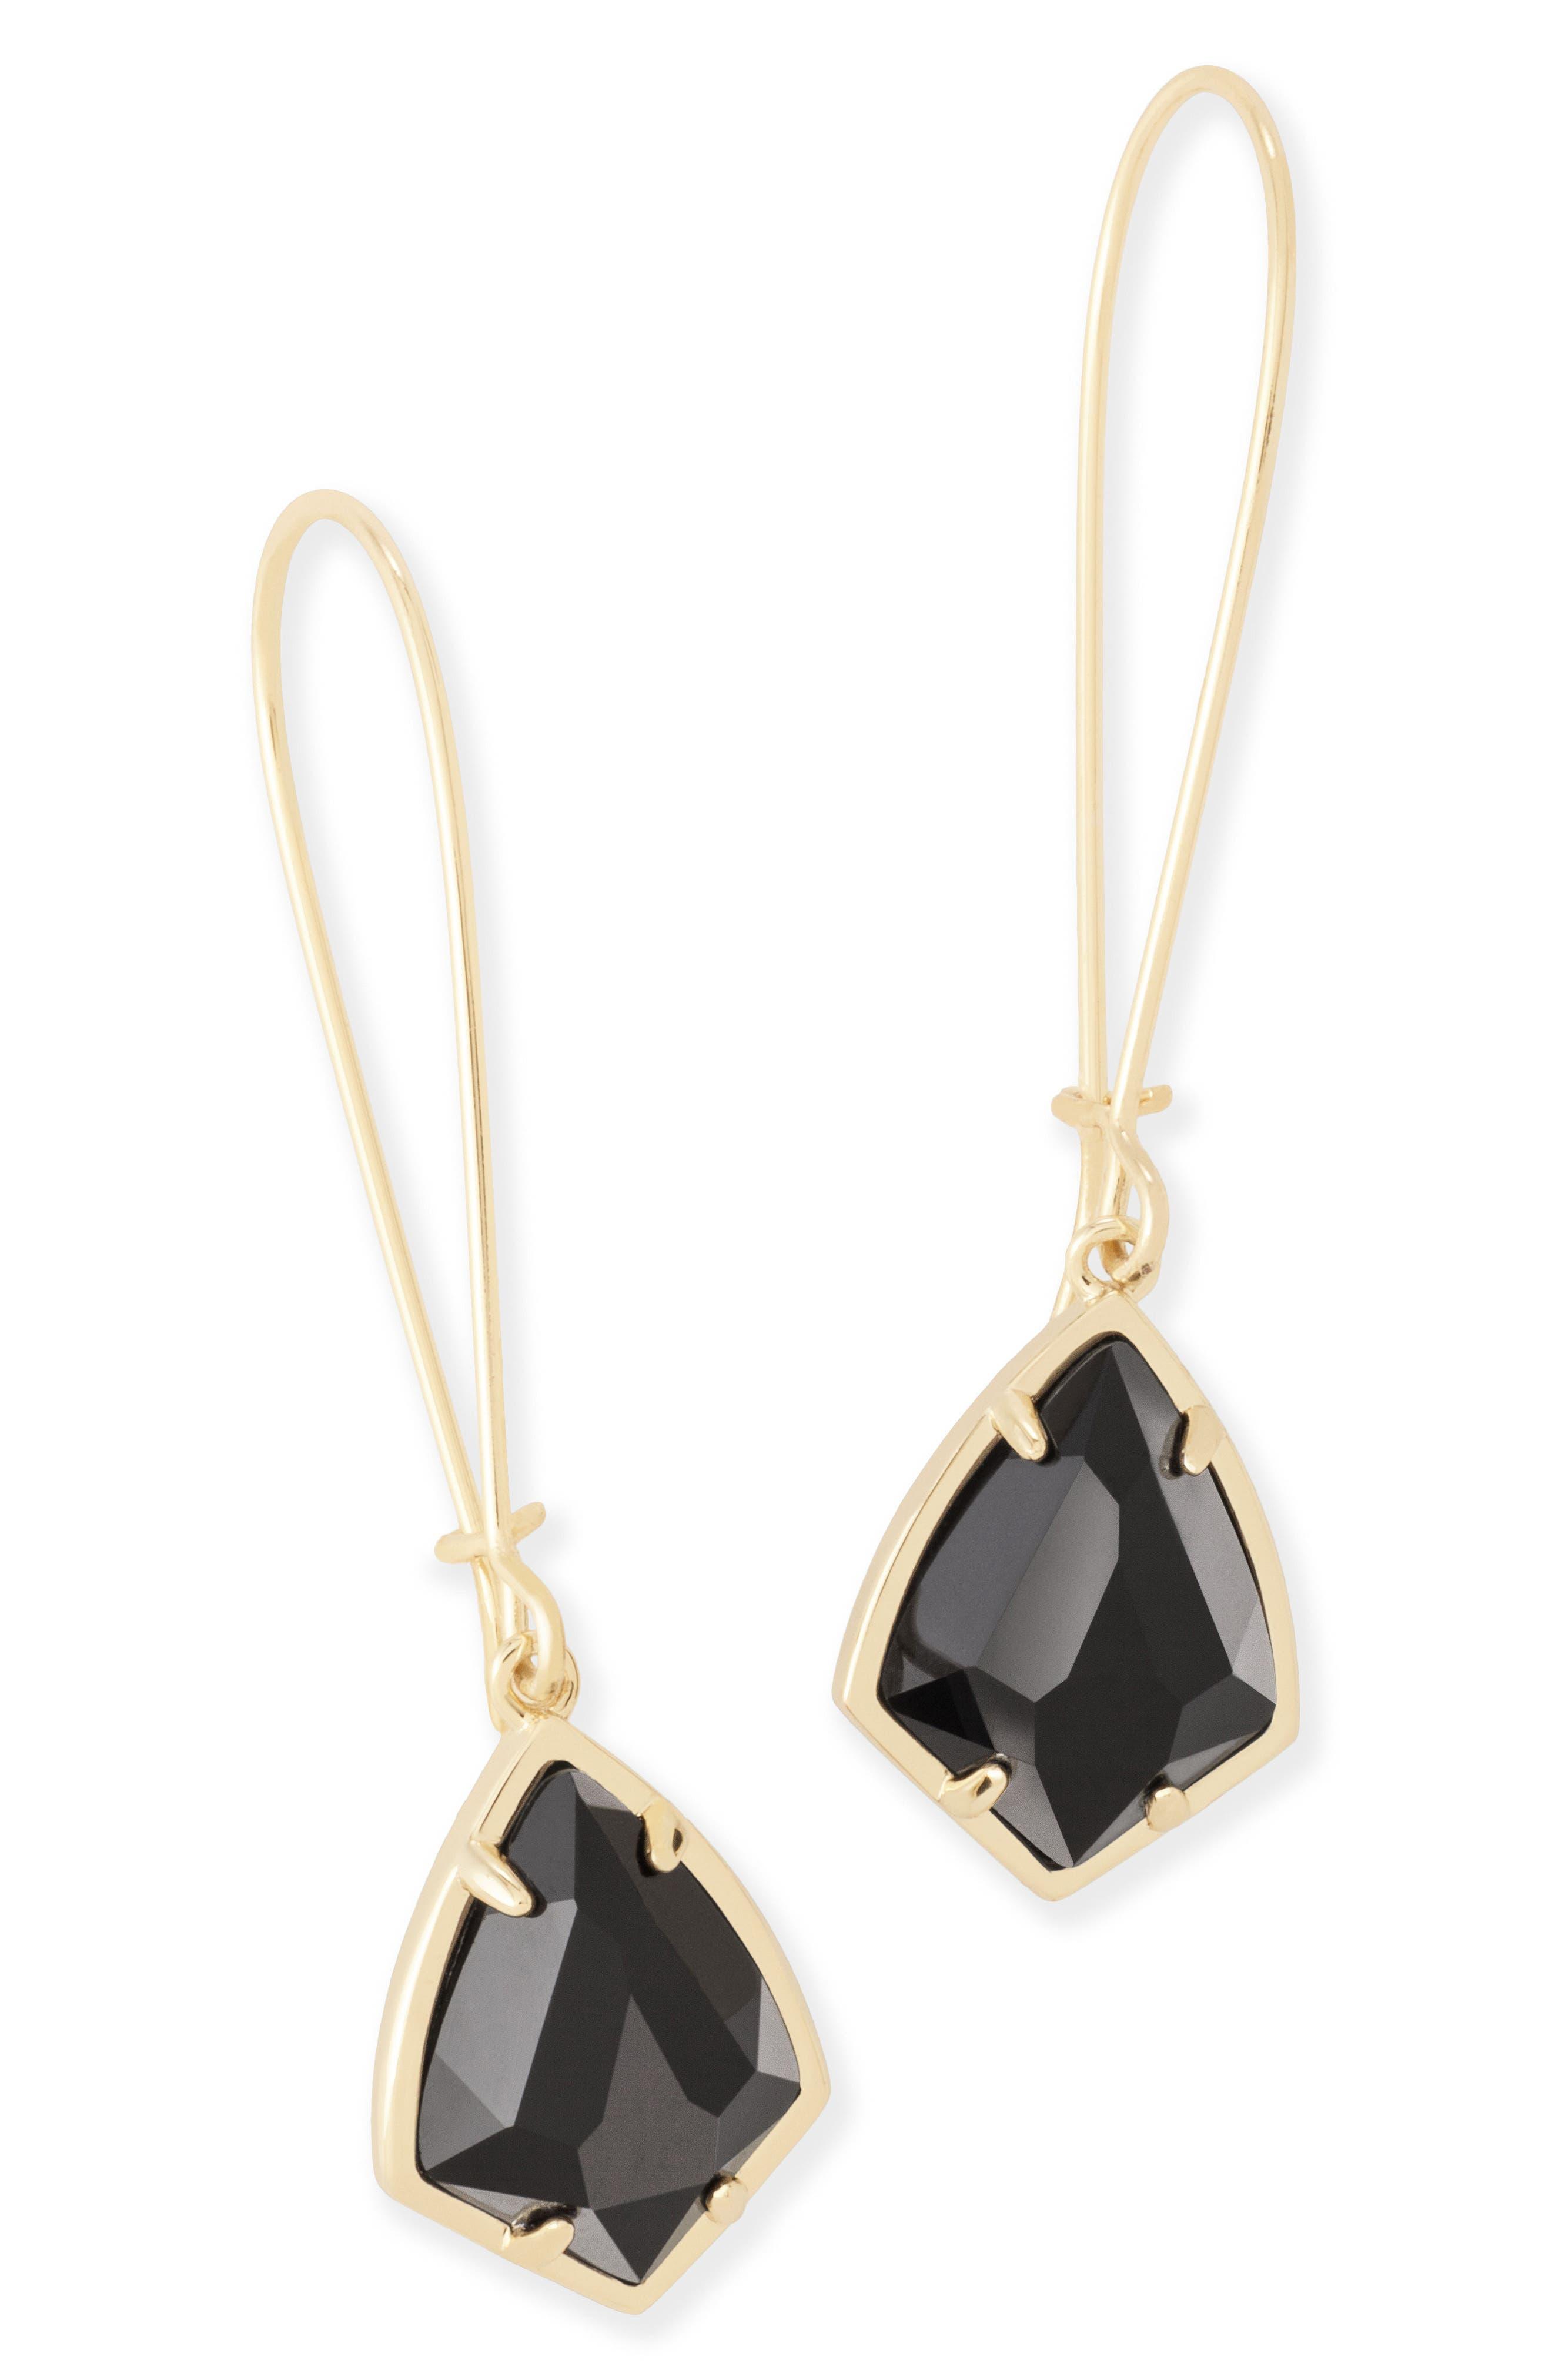 'Carrine' Semiprecious Stone Drop Earrings,                             Main thumbnail 1, color,                             Black/ Gold